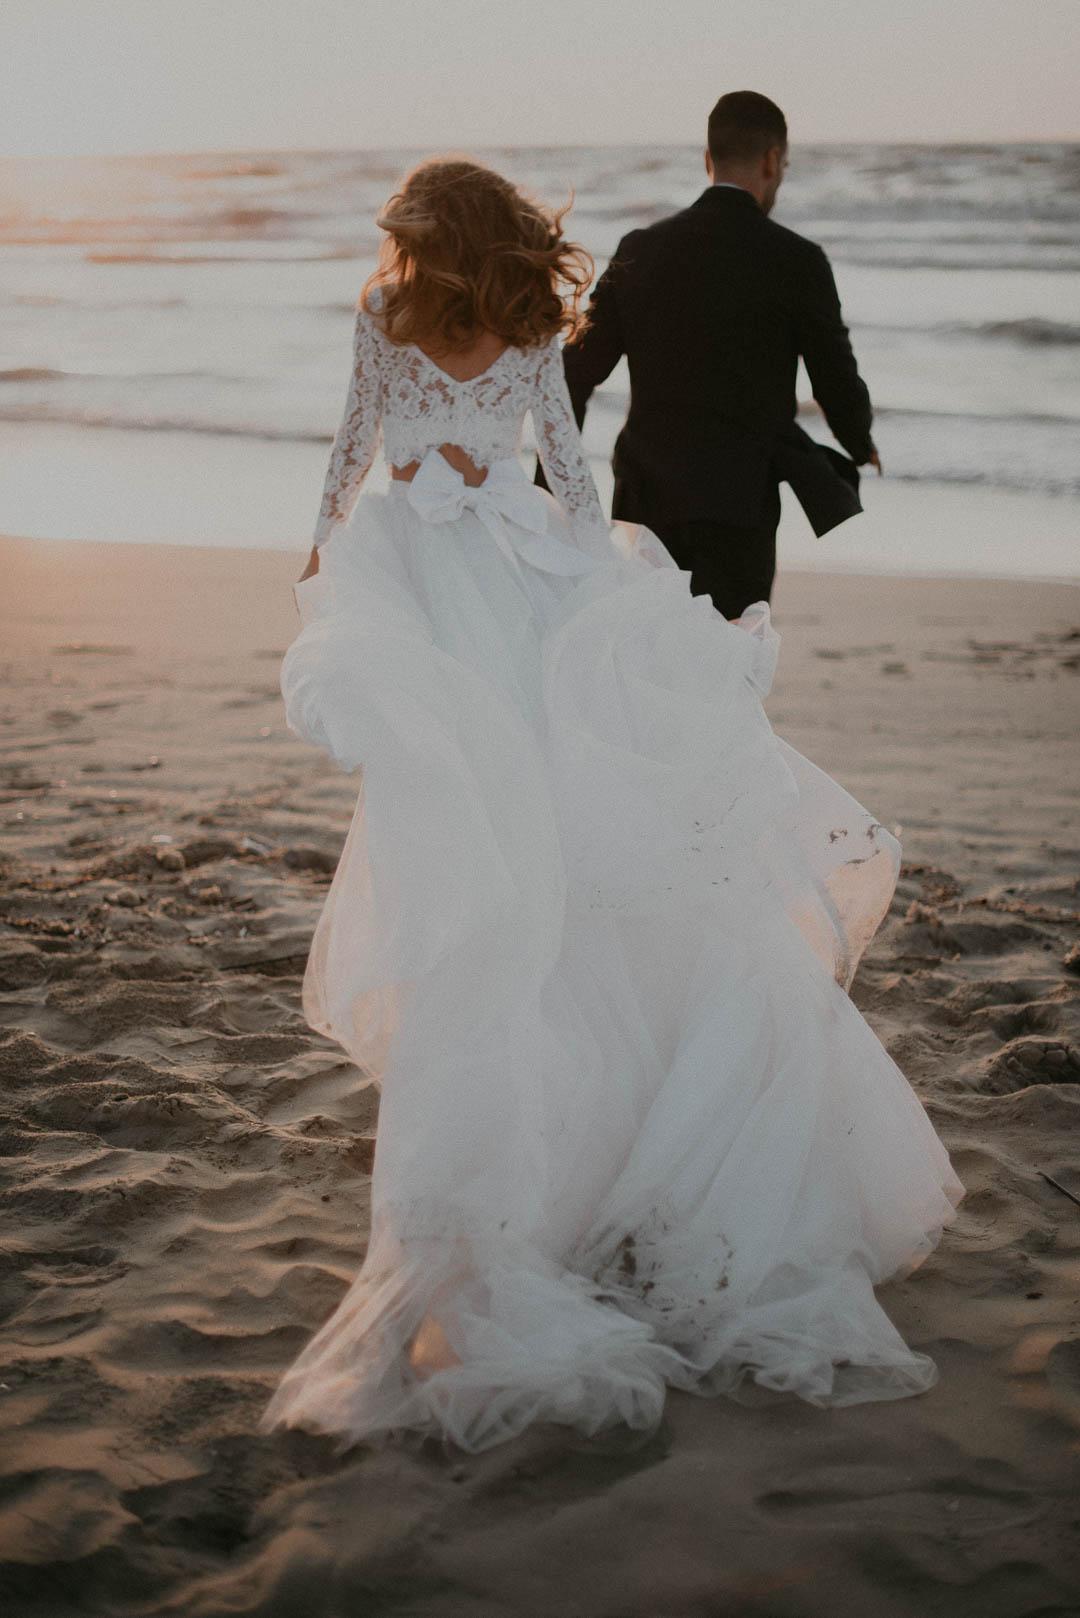 wedding-photographer-destination-fineart-bespoke-reportage-napoli-nabilah-vivianeizzo-spazio46-119